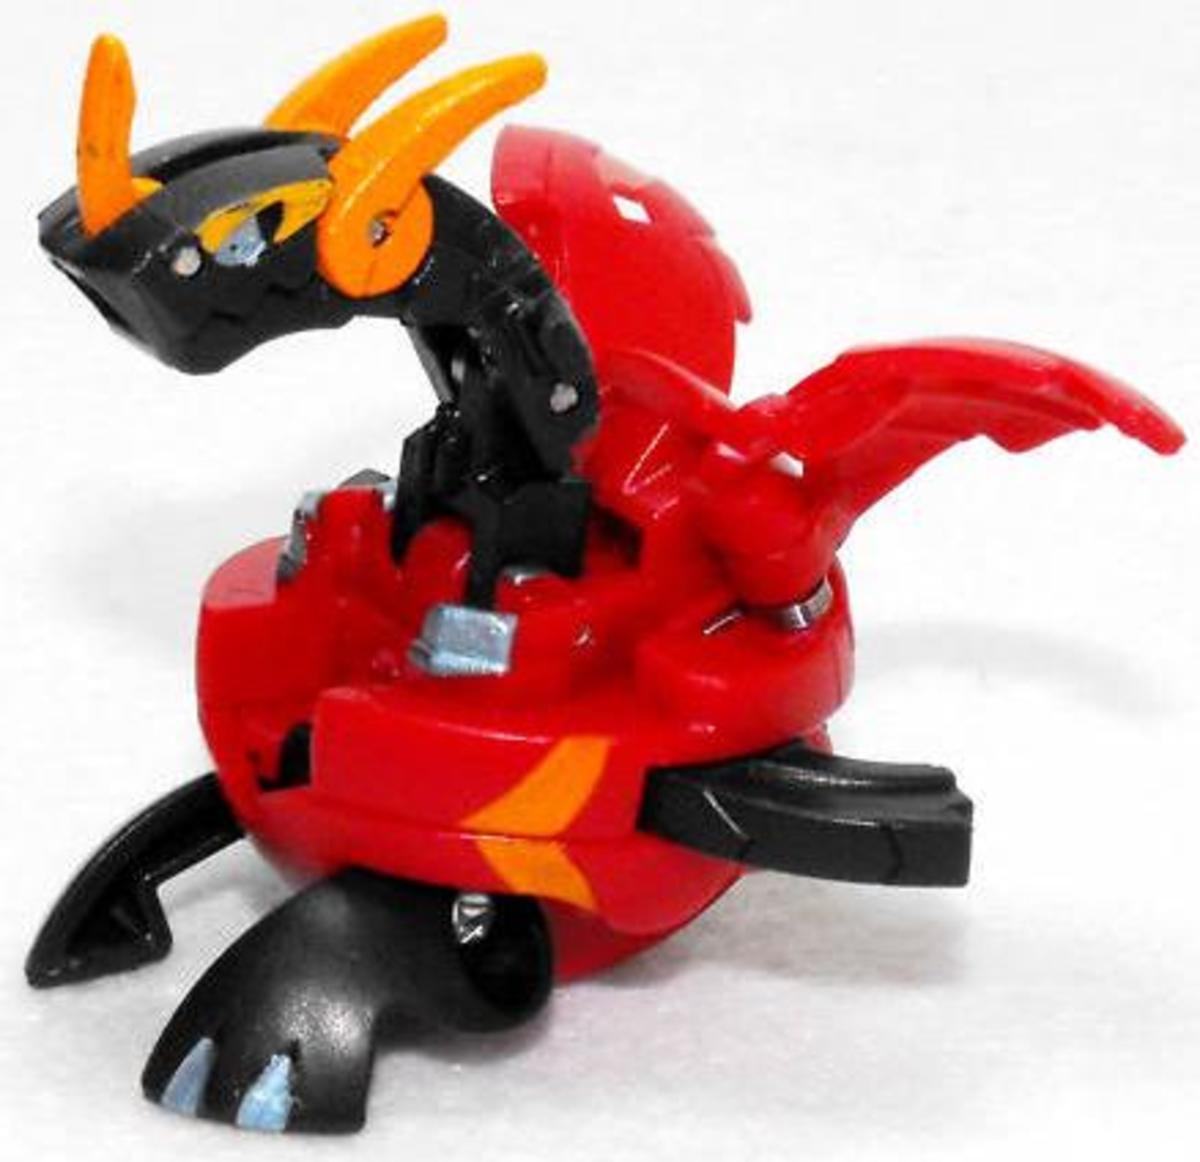 Bakugan Dragonoid & All Evolved Drago Bakugan Toy